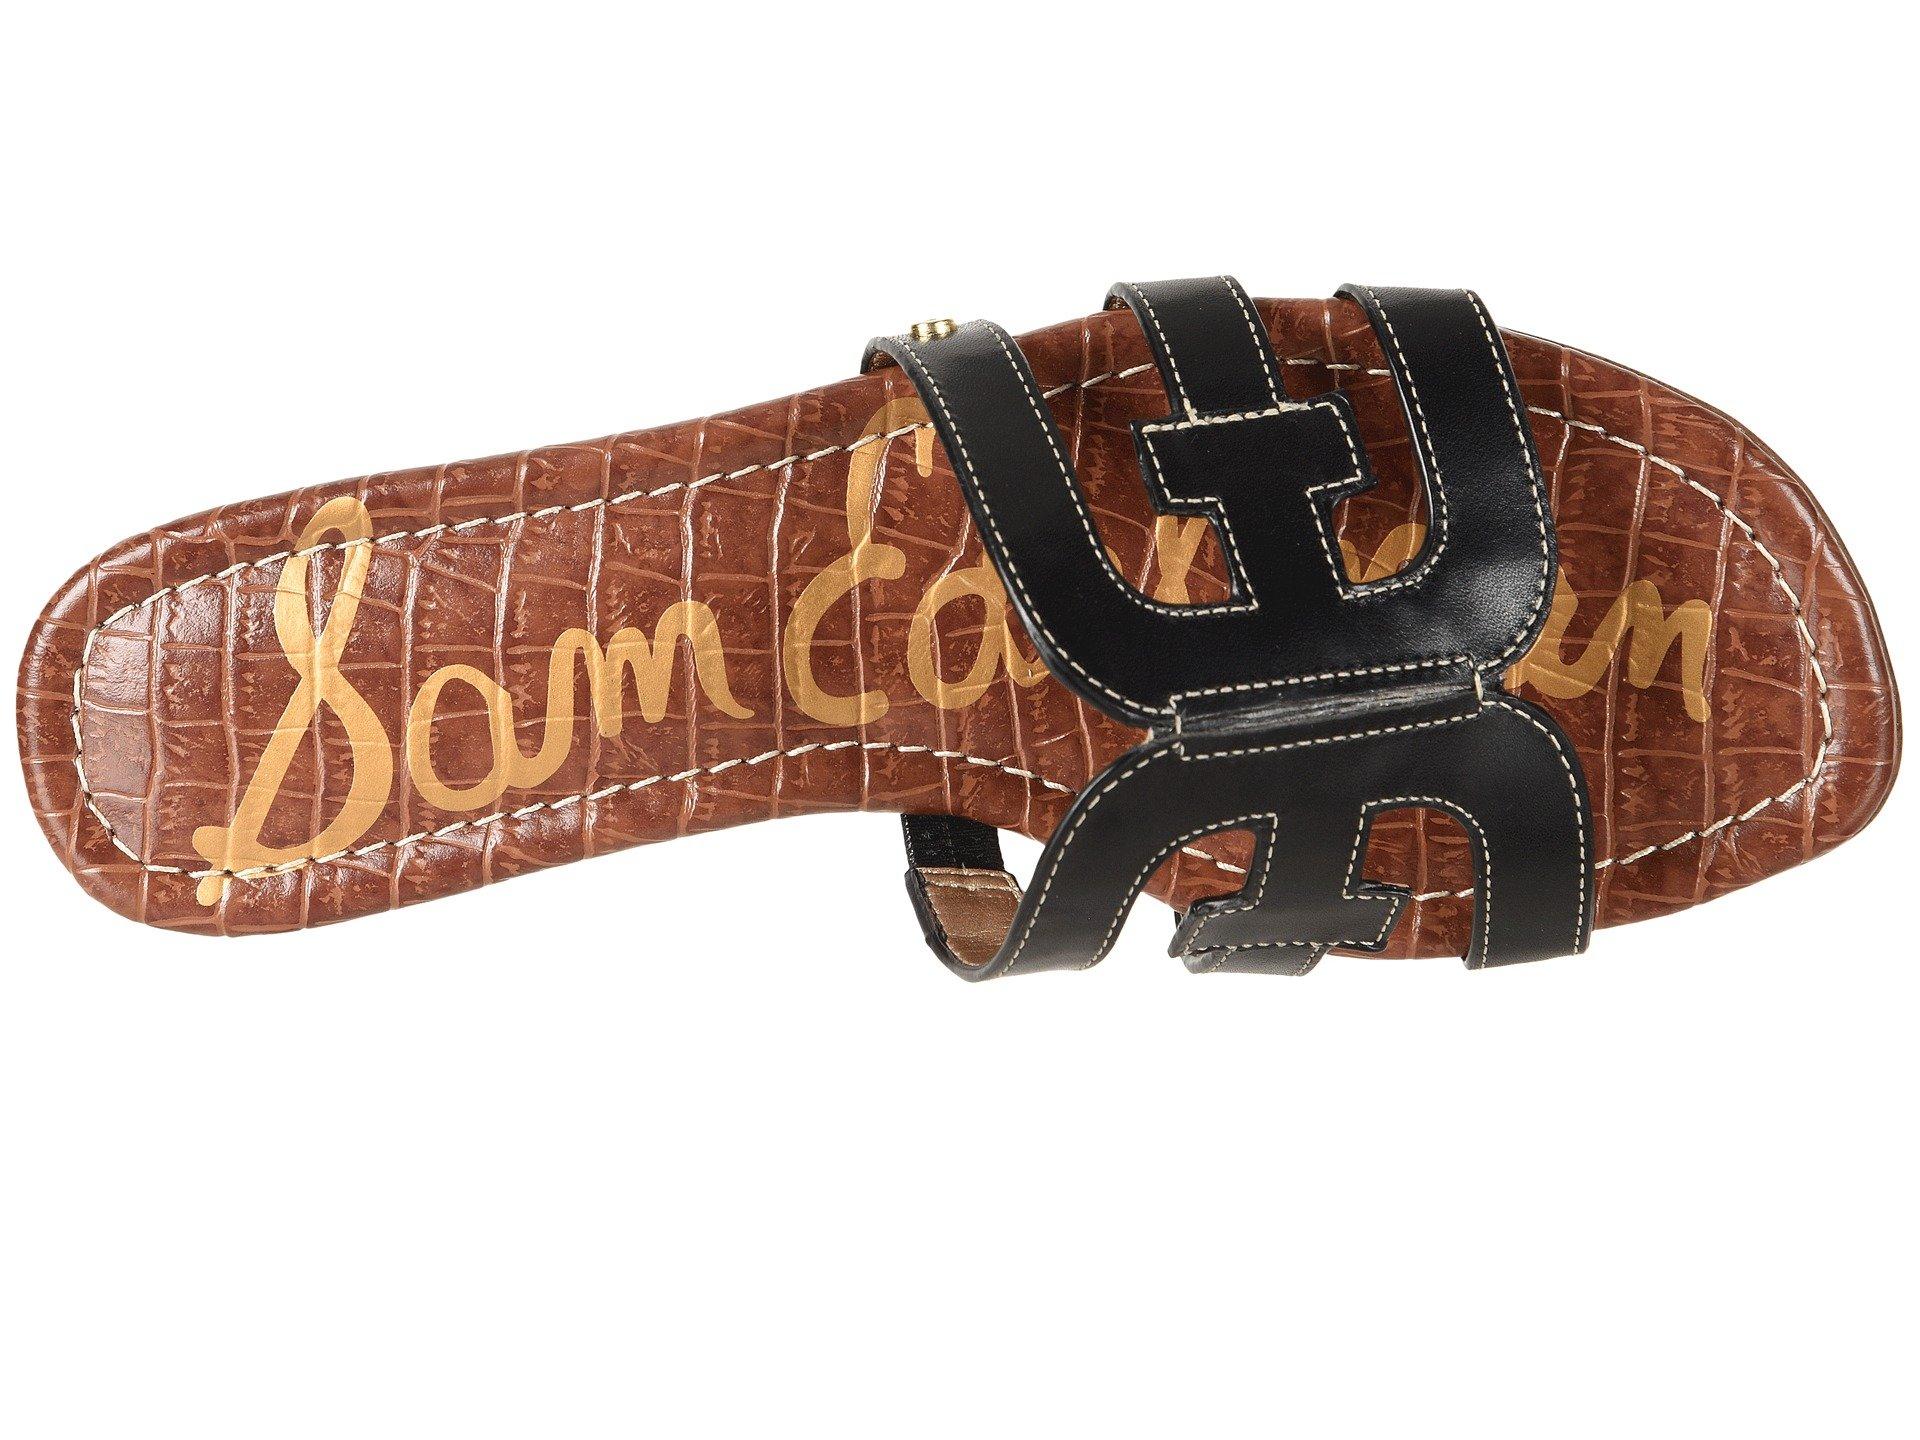 Black Edelman Leather Saddle Sam Bay Vaquero wvqBRaE